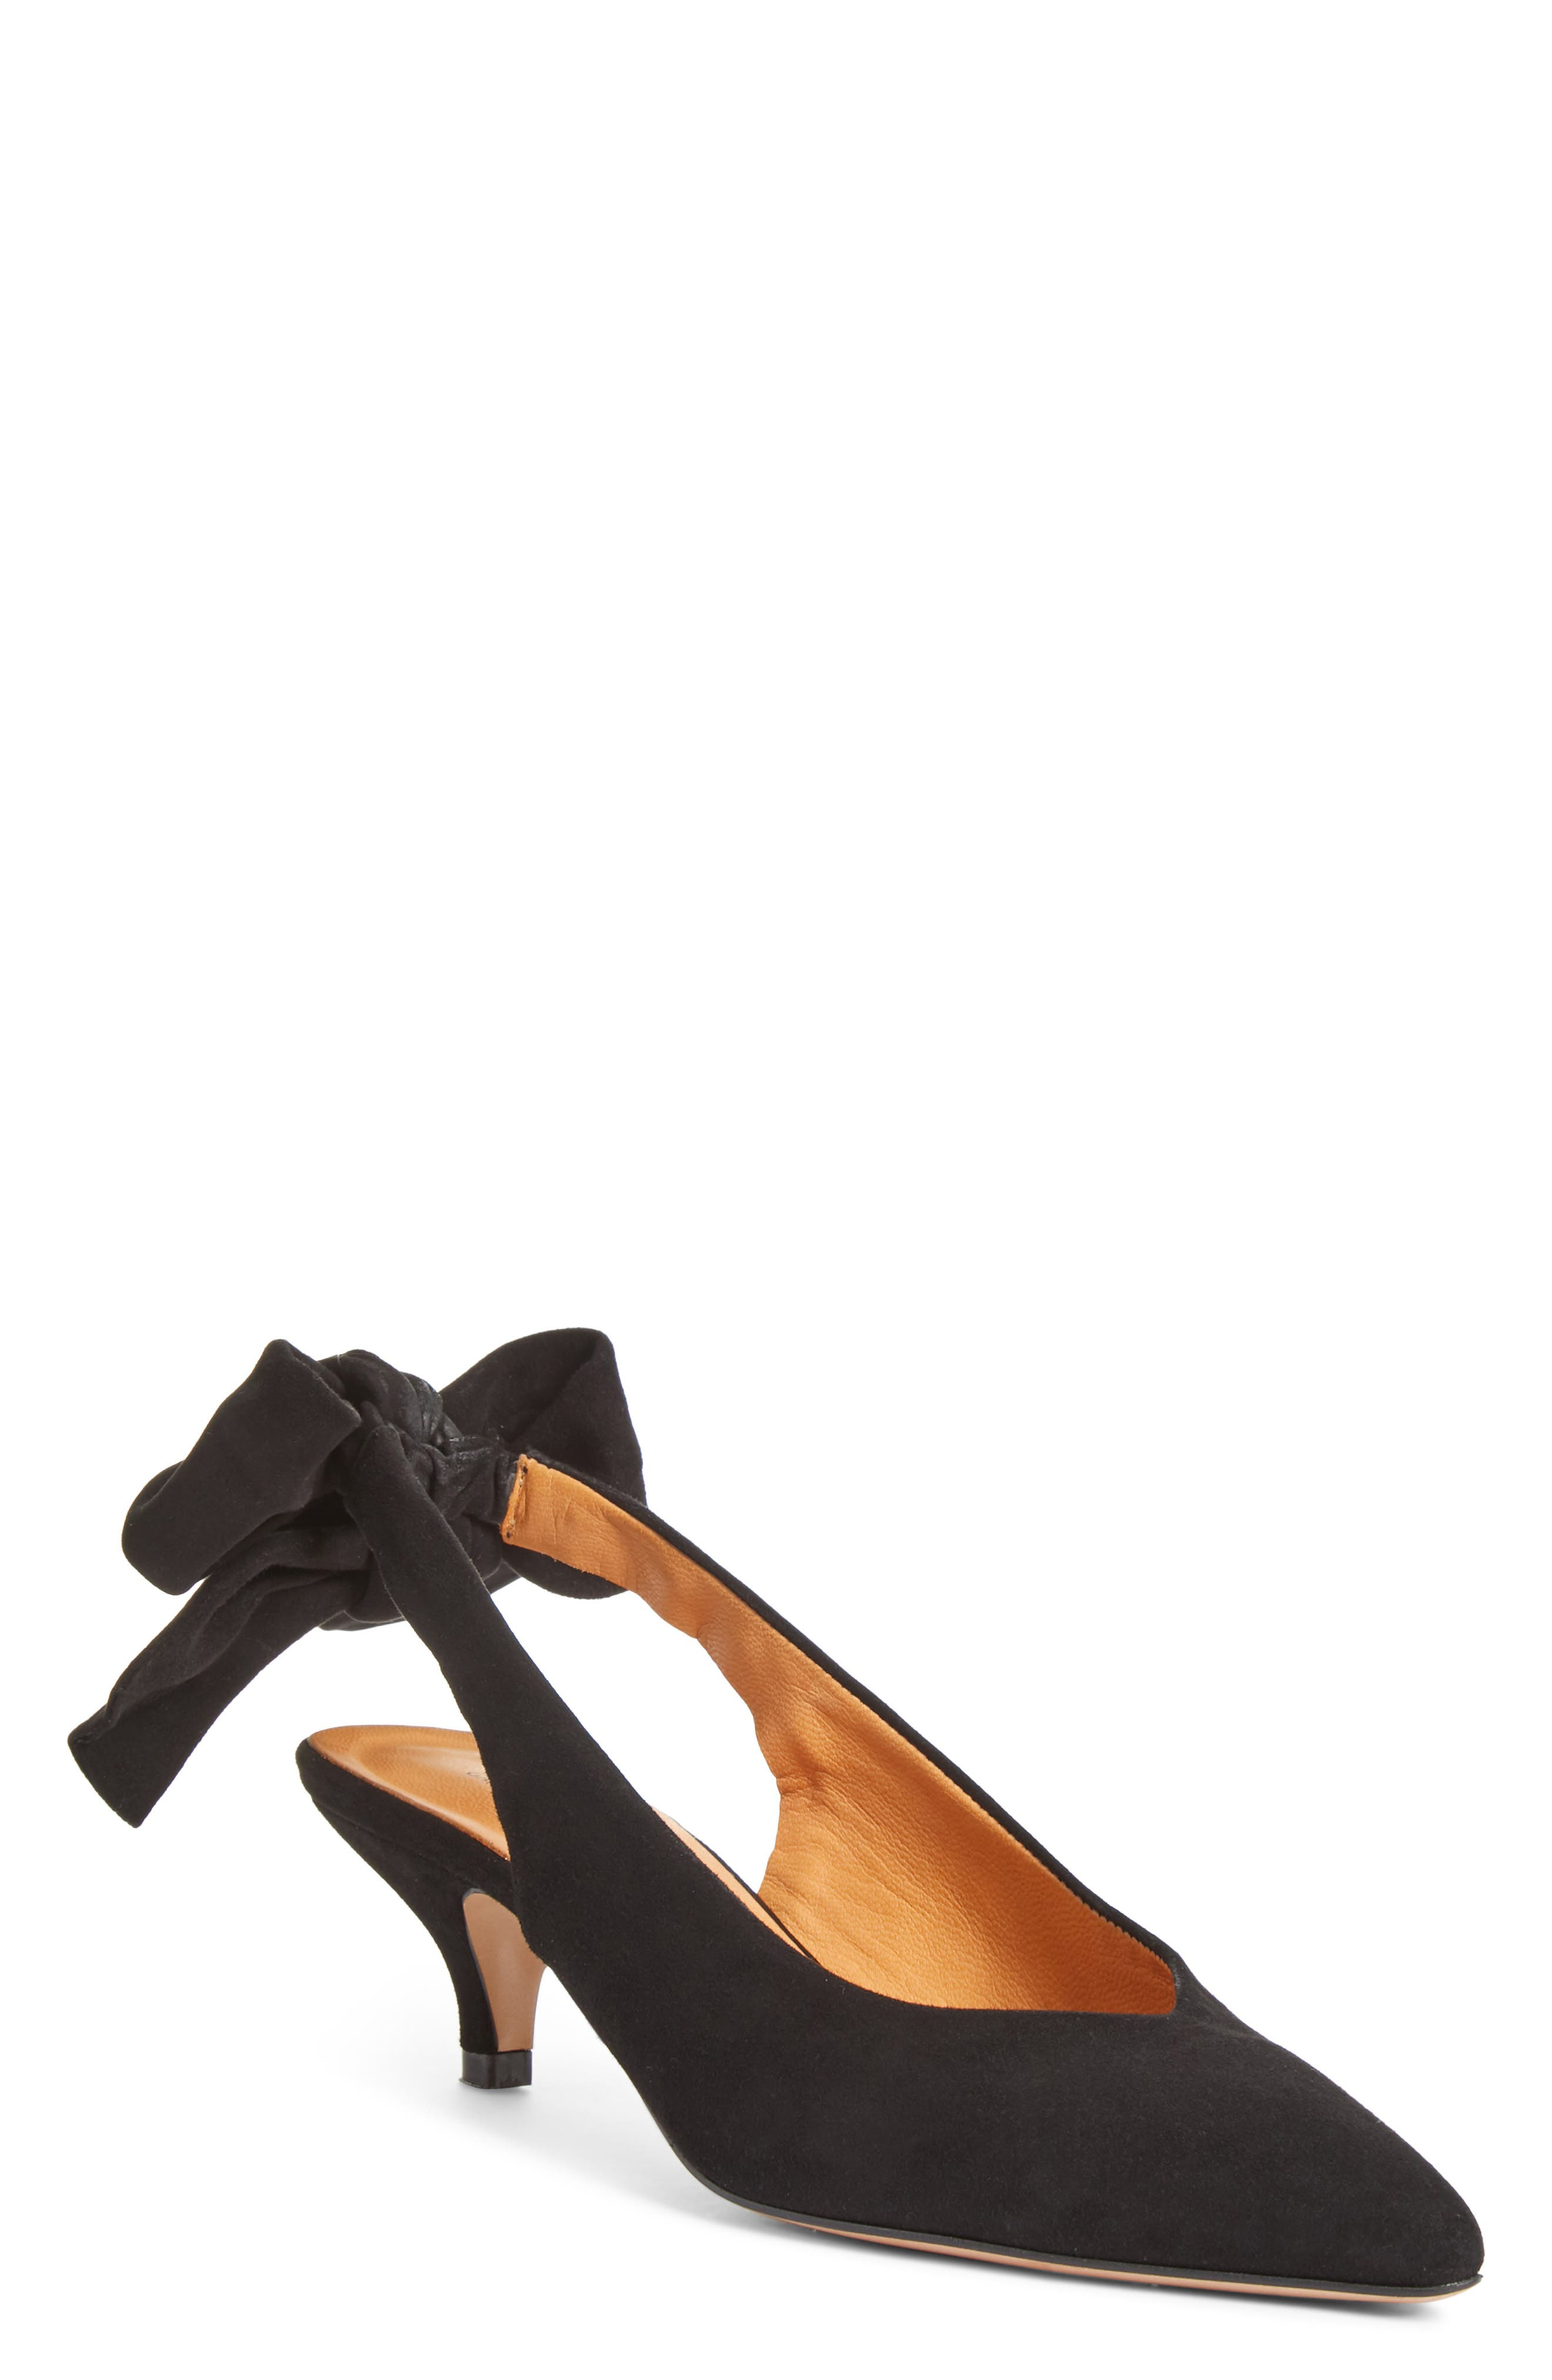 Bow Kitten Heel Pump,                             Main thumbnail 1, color,                             BLACK 099